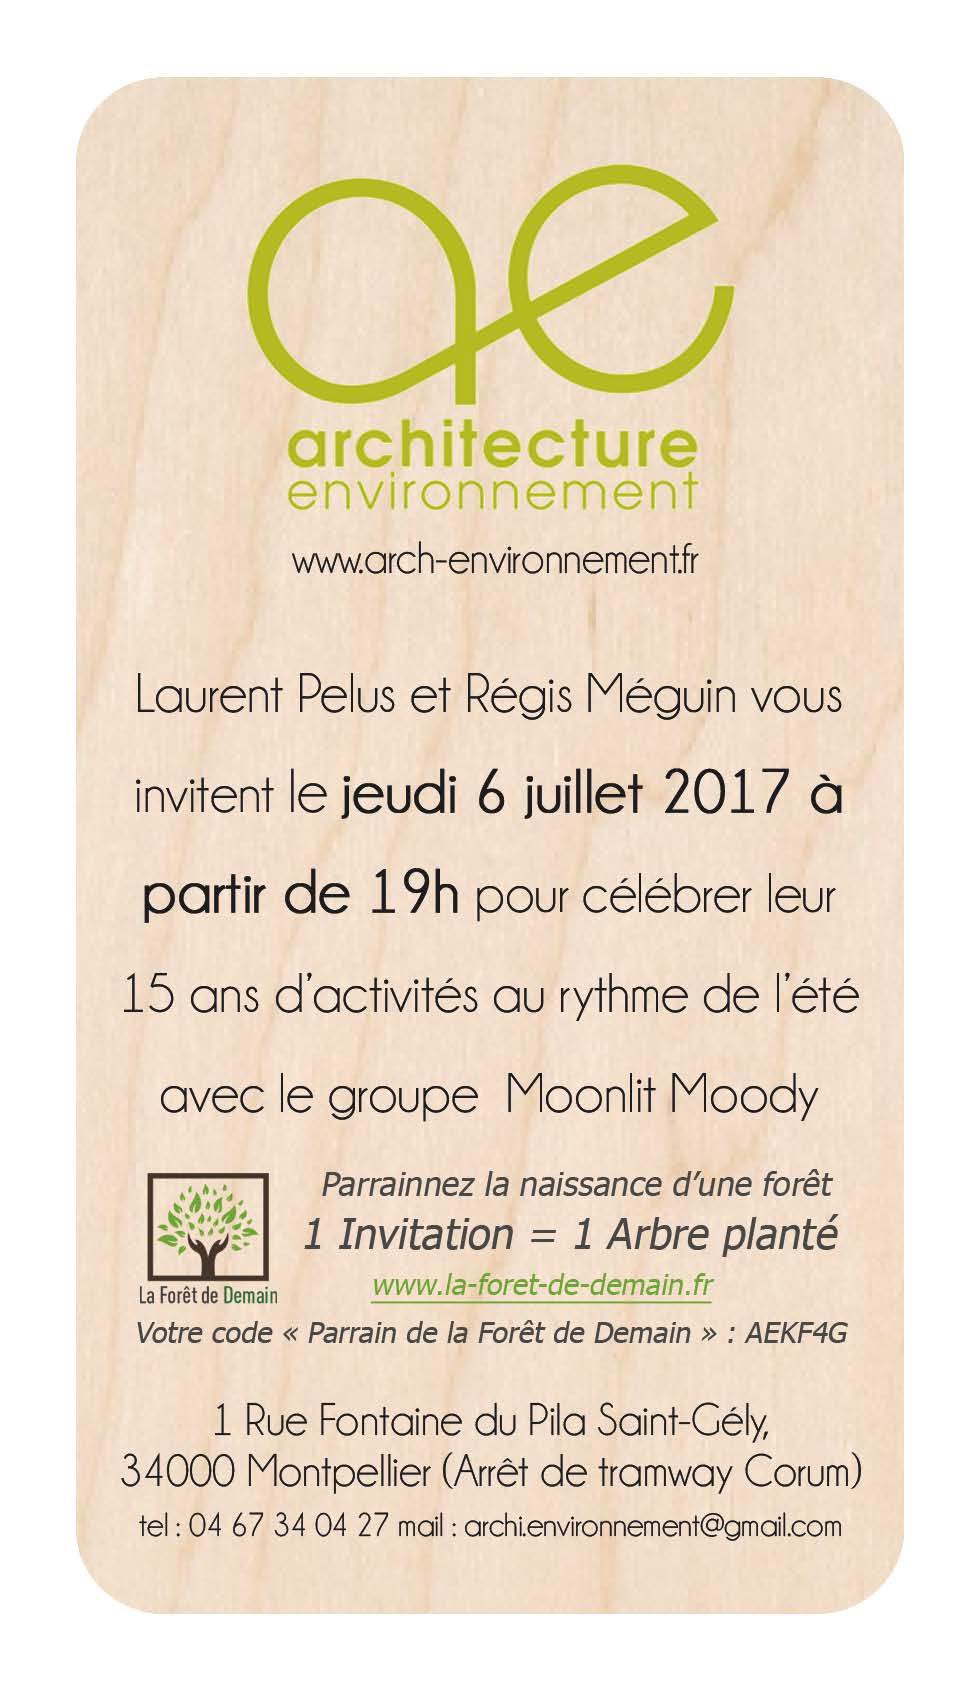 invitation-15-ans-ae-06-07-17